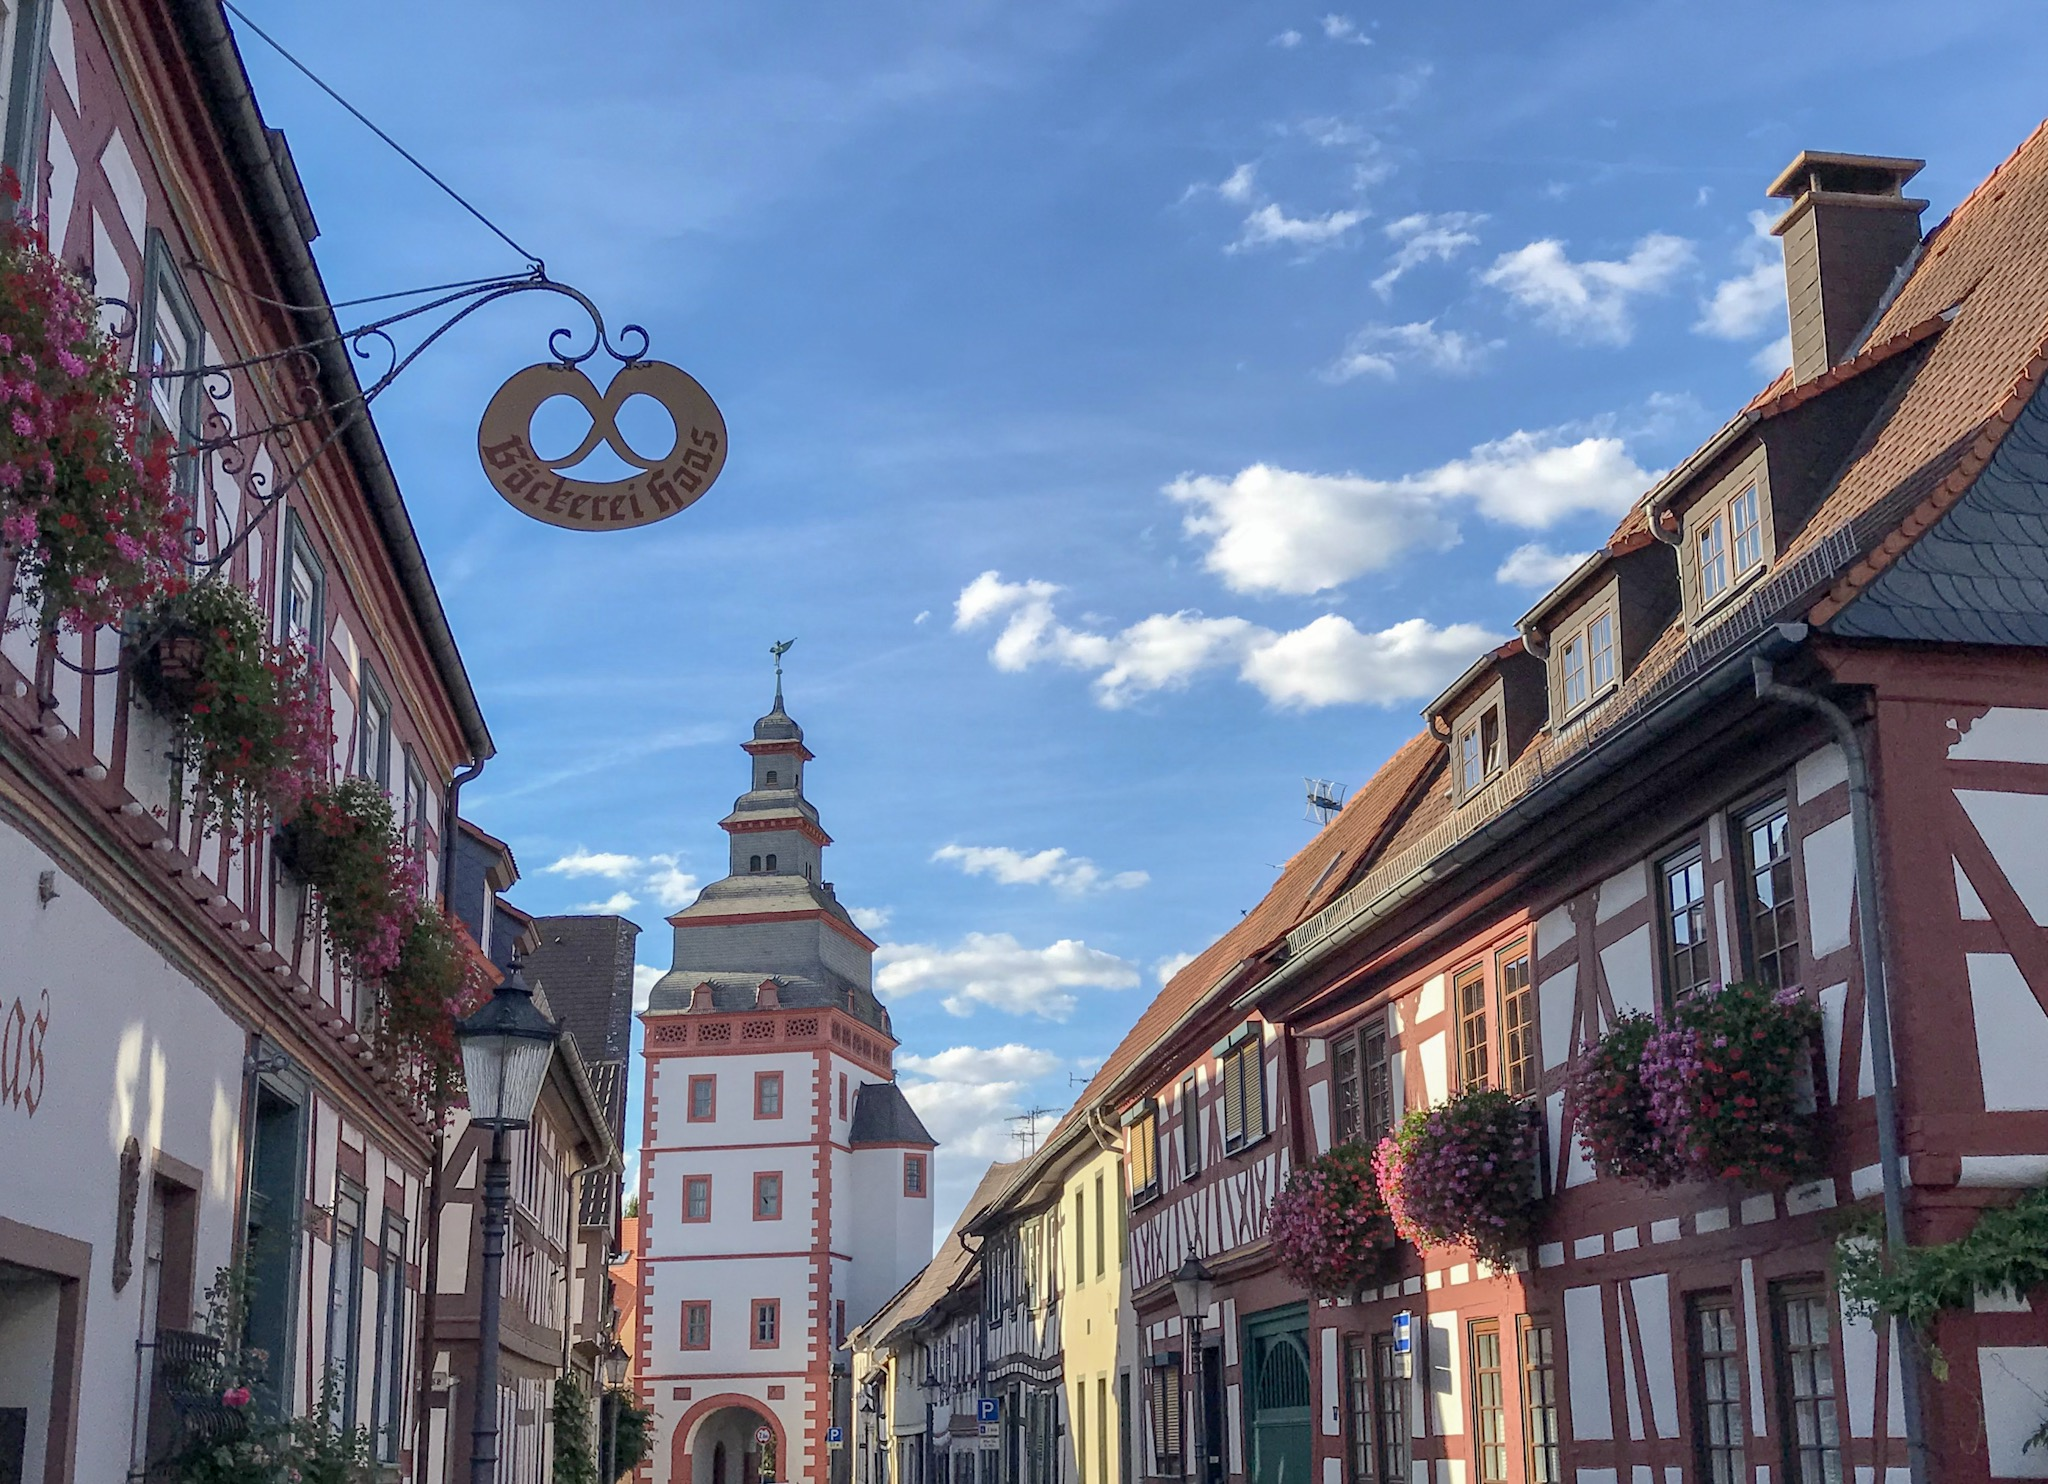 Seligenstadt, Germany